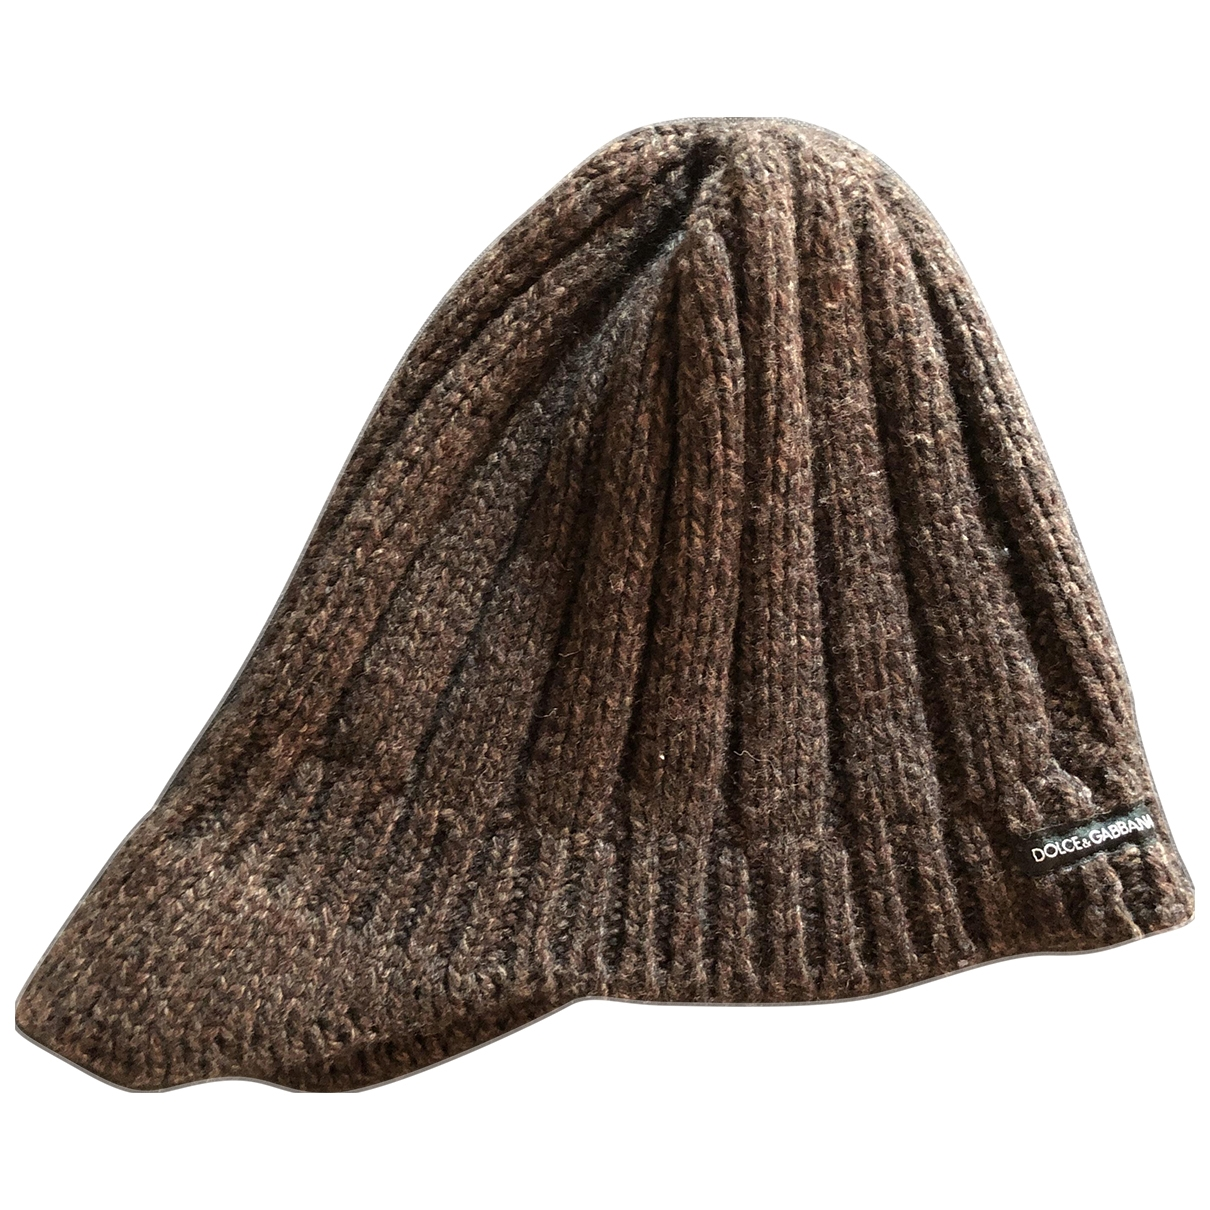 Dolce & Gabbana \N Grey Wool hat & pull on hat for Men M International